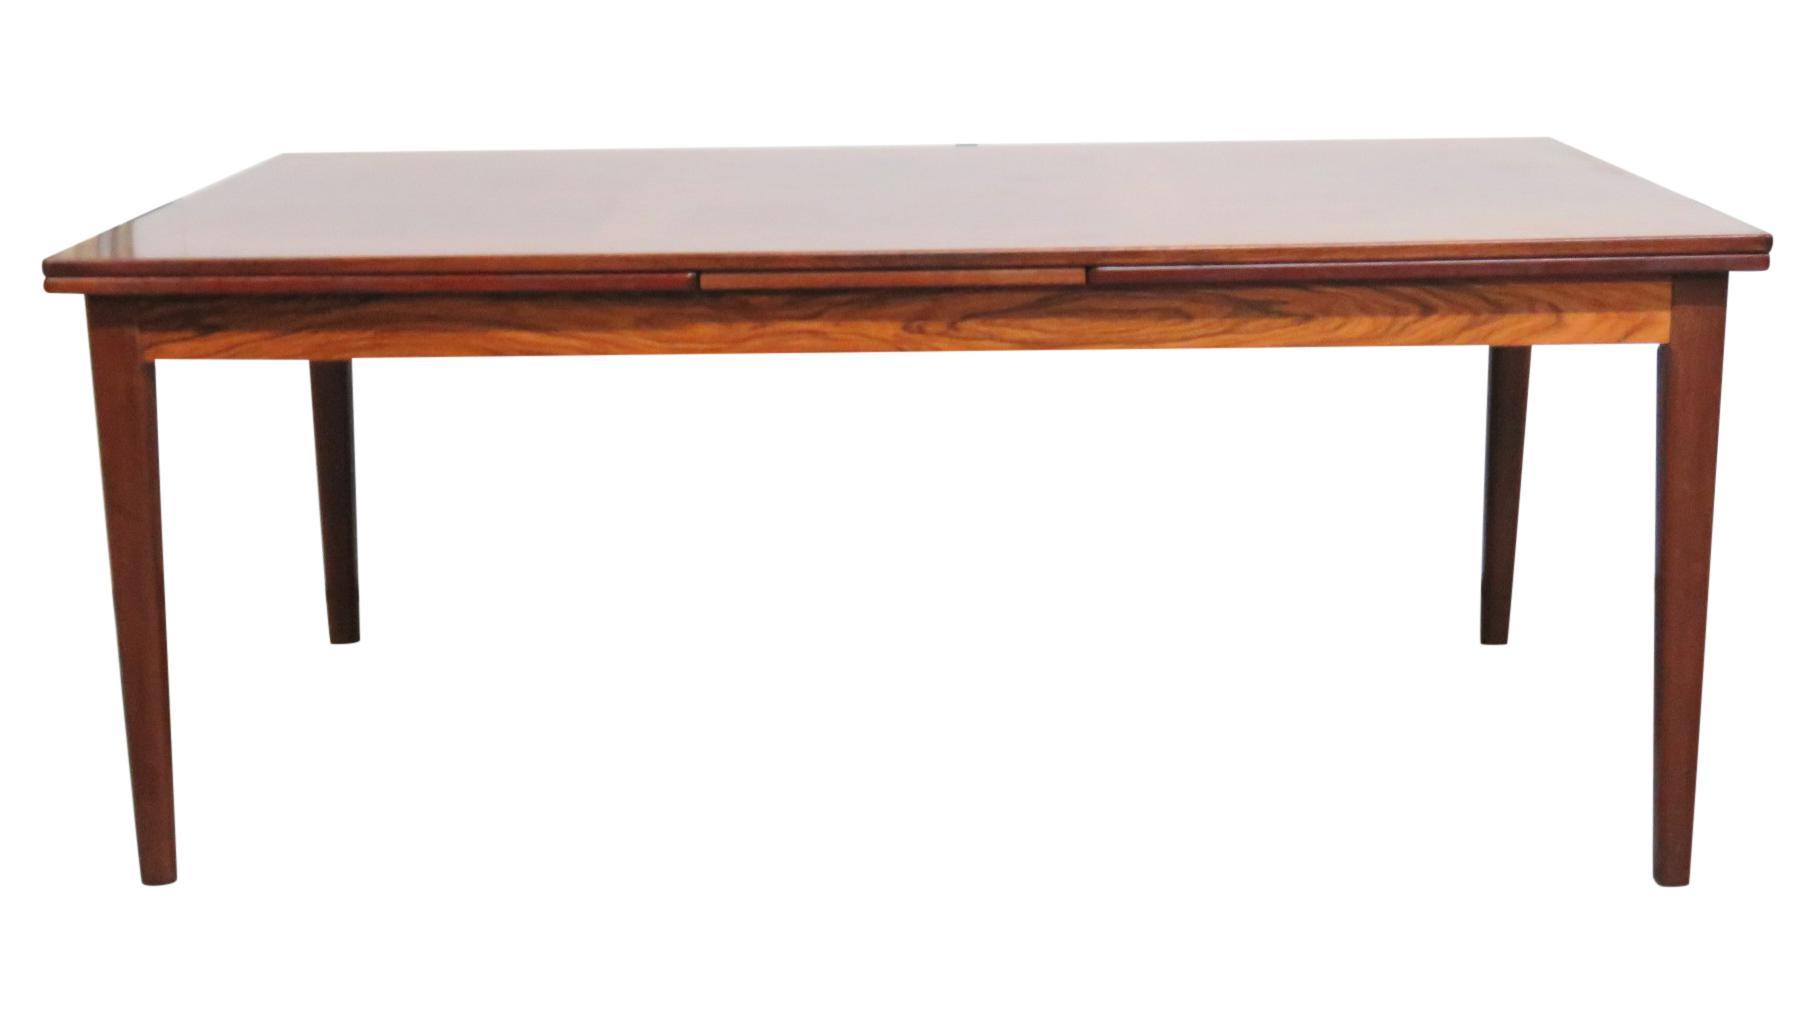 skovby rosewood dining chairs chair covers bulk mobelfabrik danish modern table